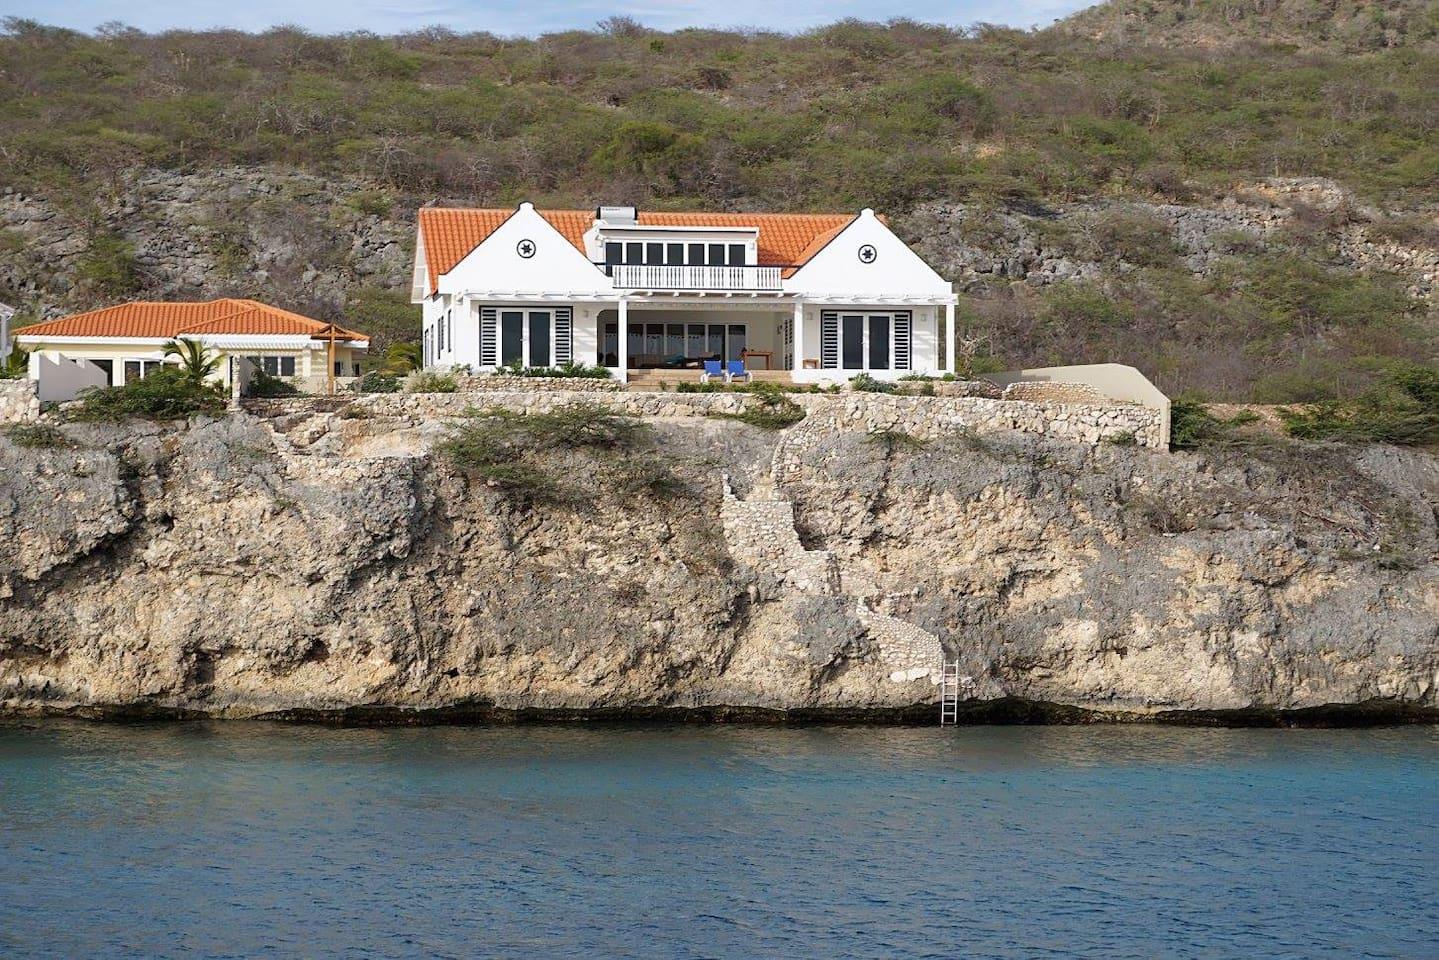 Villa bon bientu appartments   villa's te huur in lagun: curacao ...